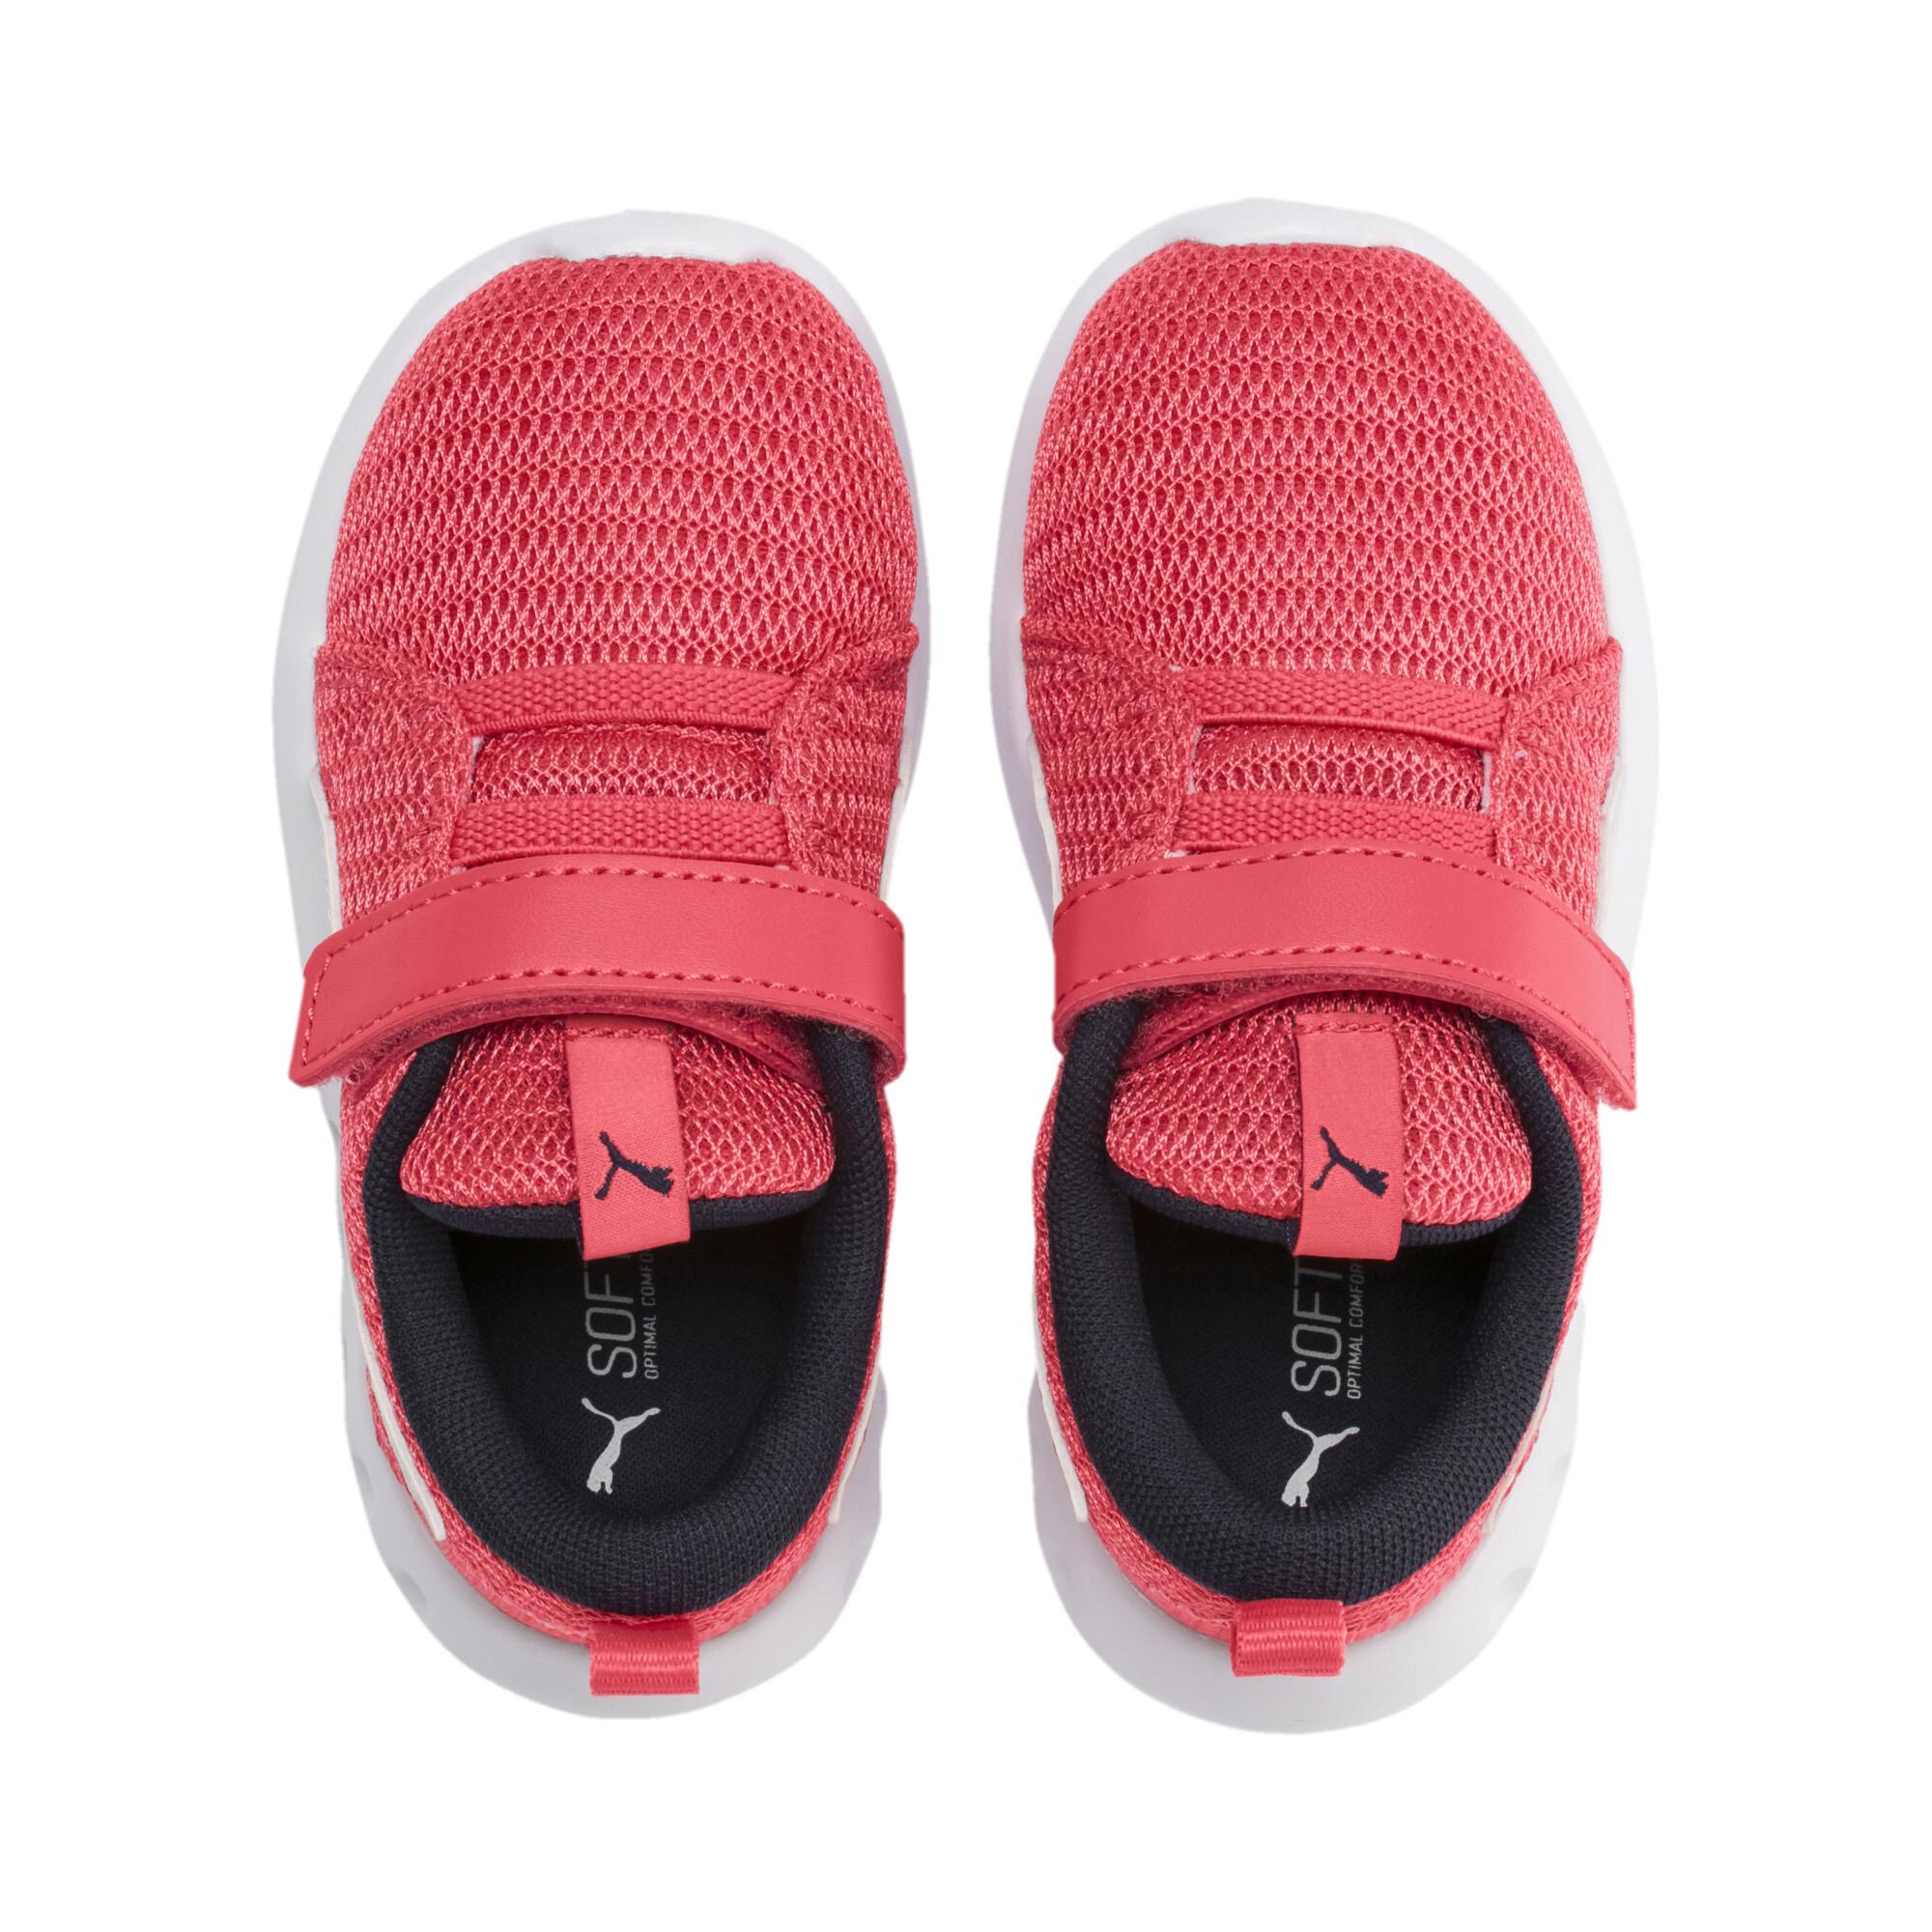 PUMA-Infant-Carson-2-Shoes thumbnail 16